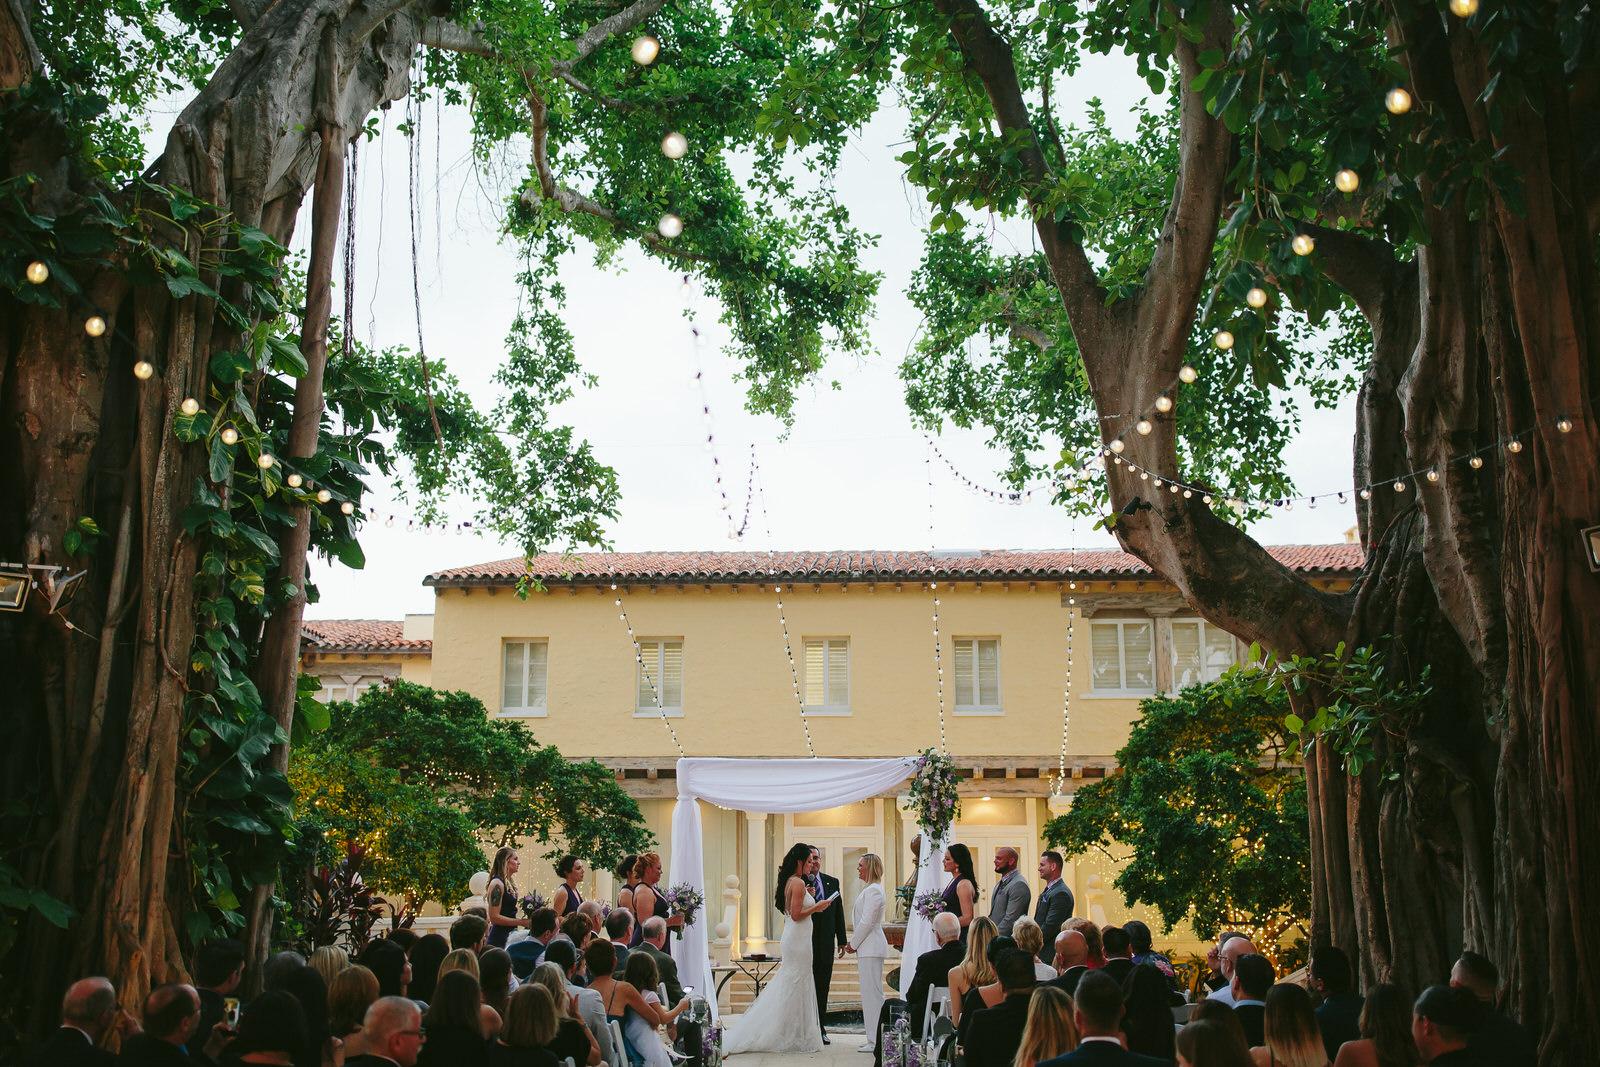 international_wedding_photographer_tiny_house_photo.jpg